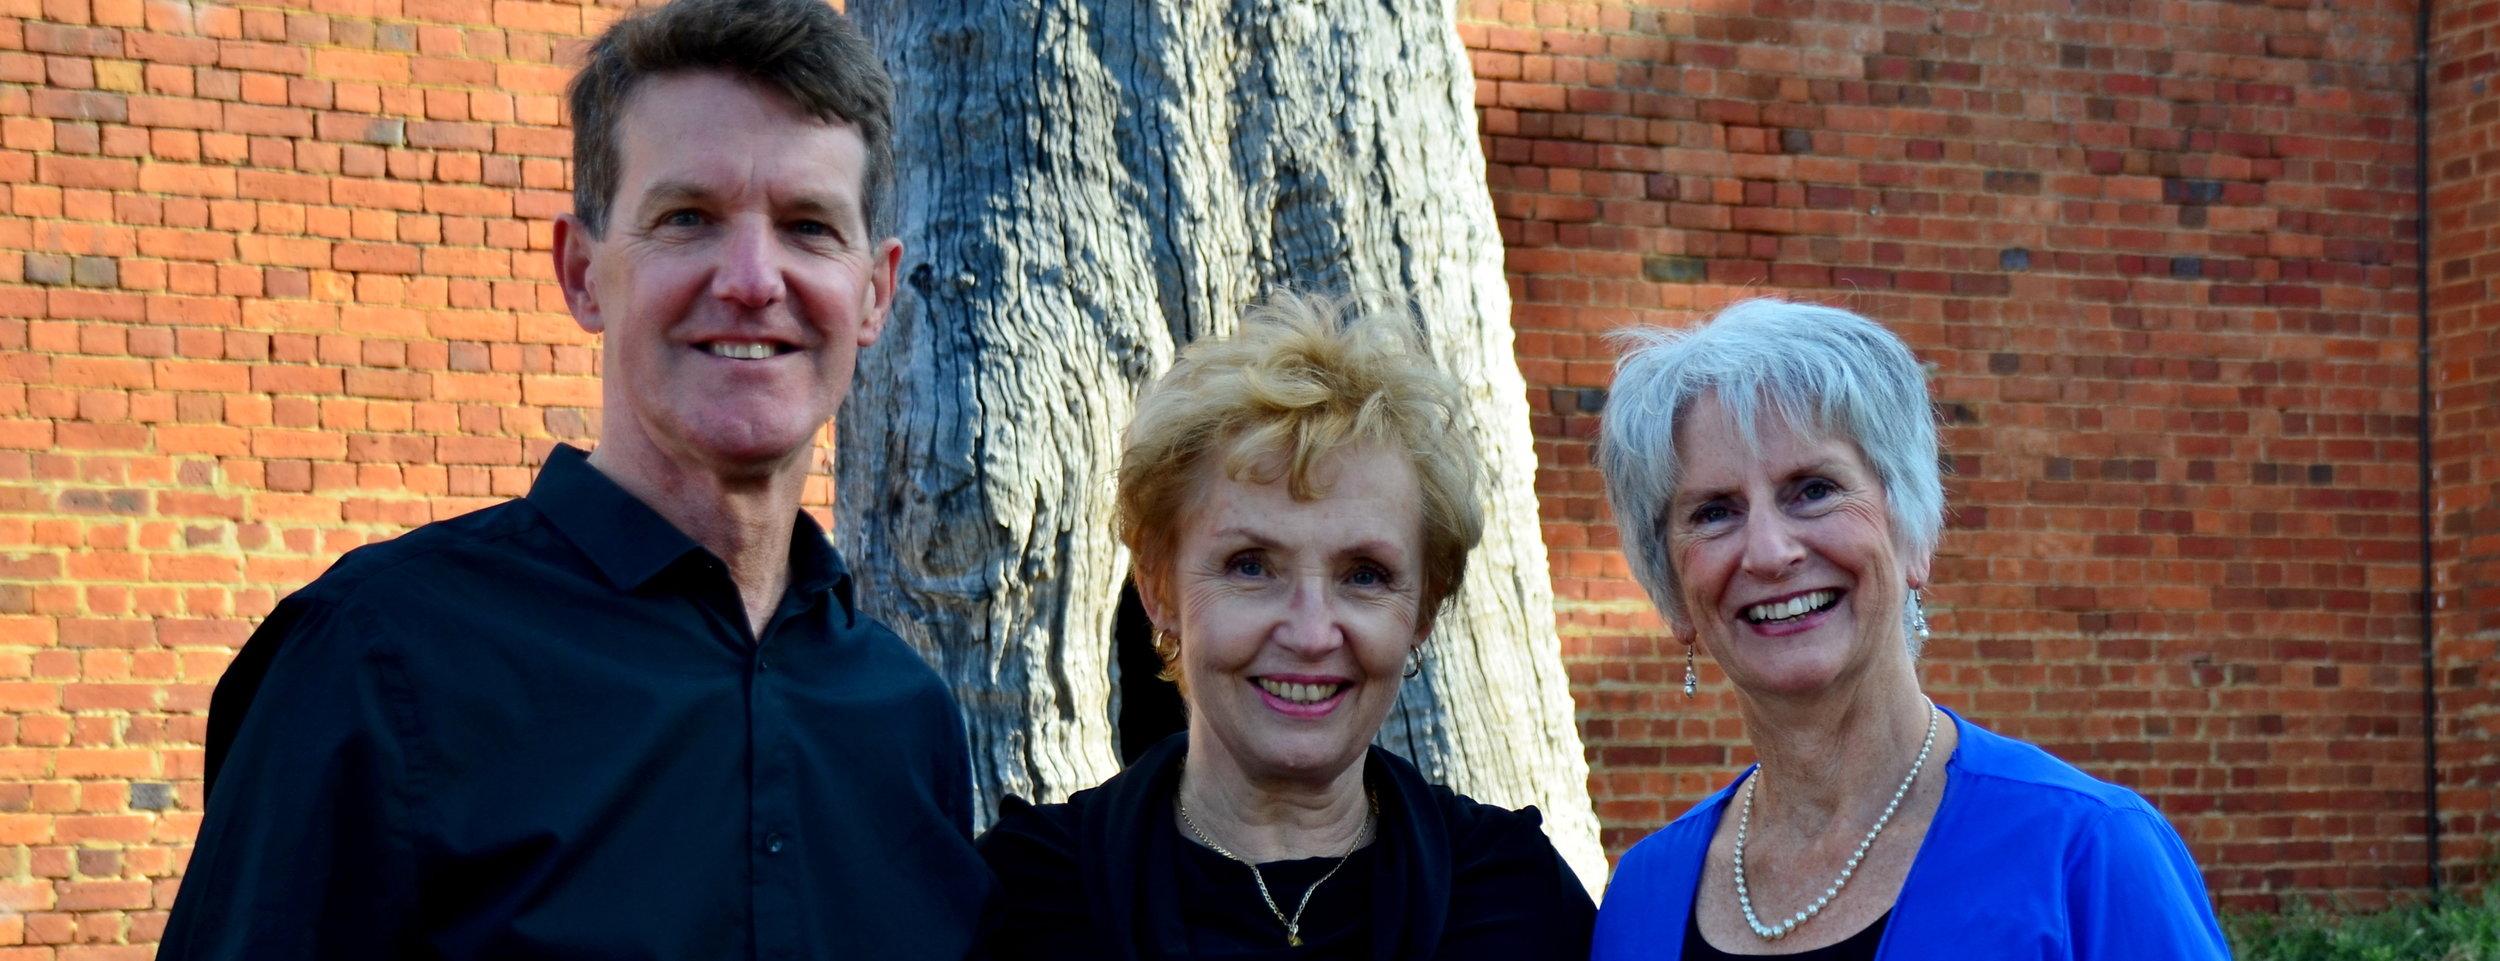 Leadership Team 2019: Laura Dusselje, Peter Butler & Valerie Lovejoy